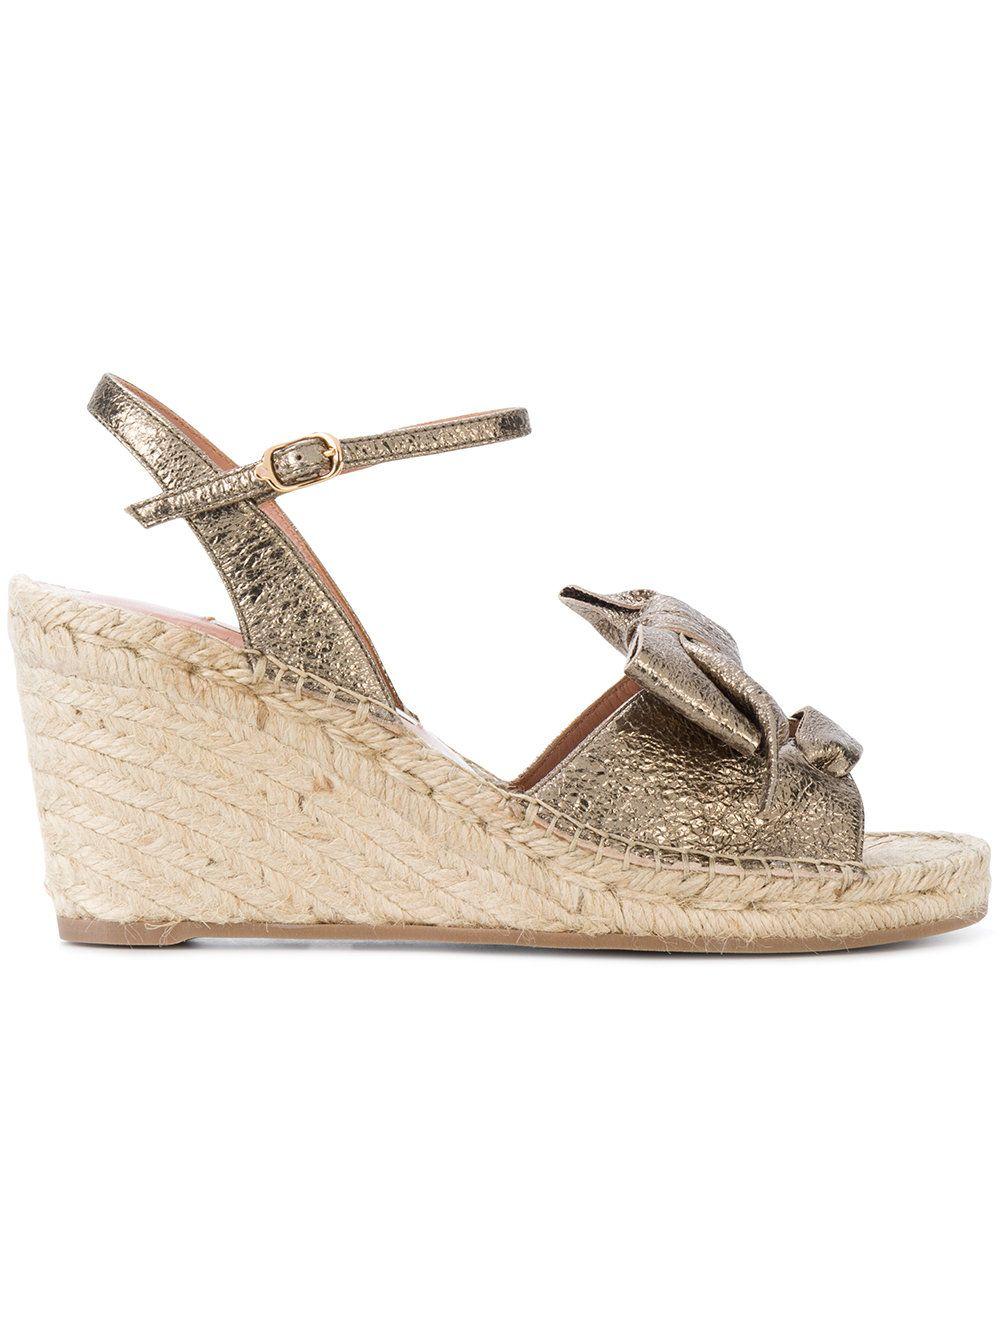 2acffc6eceef L Autre Chose wedge espadrille sandals